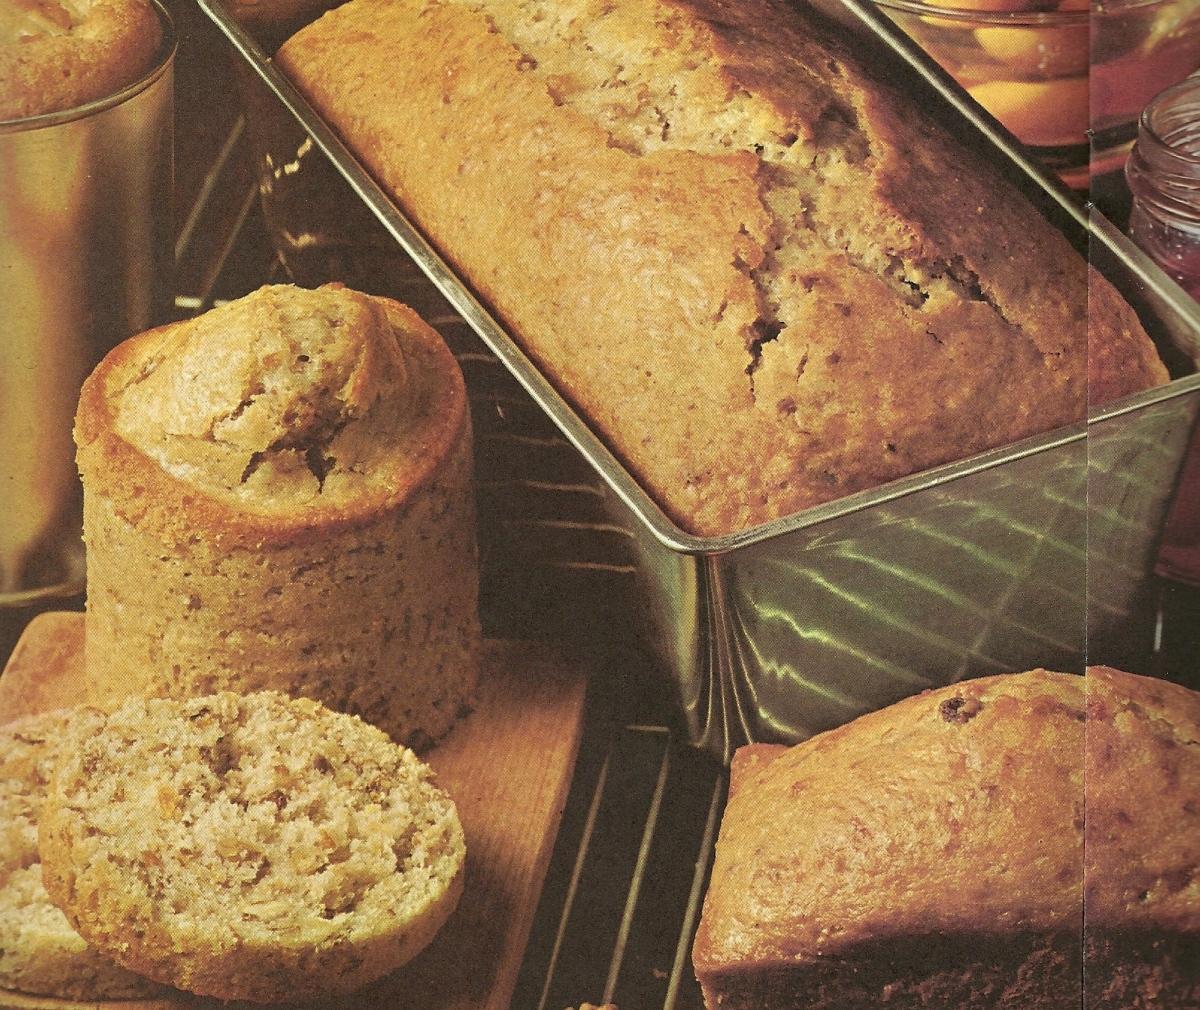 Vintage recipes, quick breads, tea breads